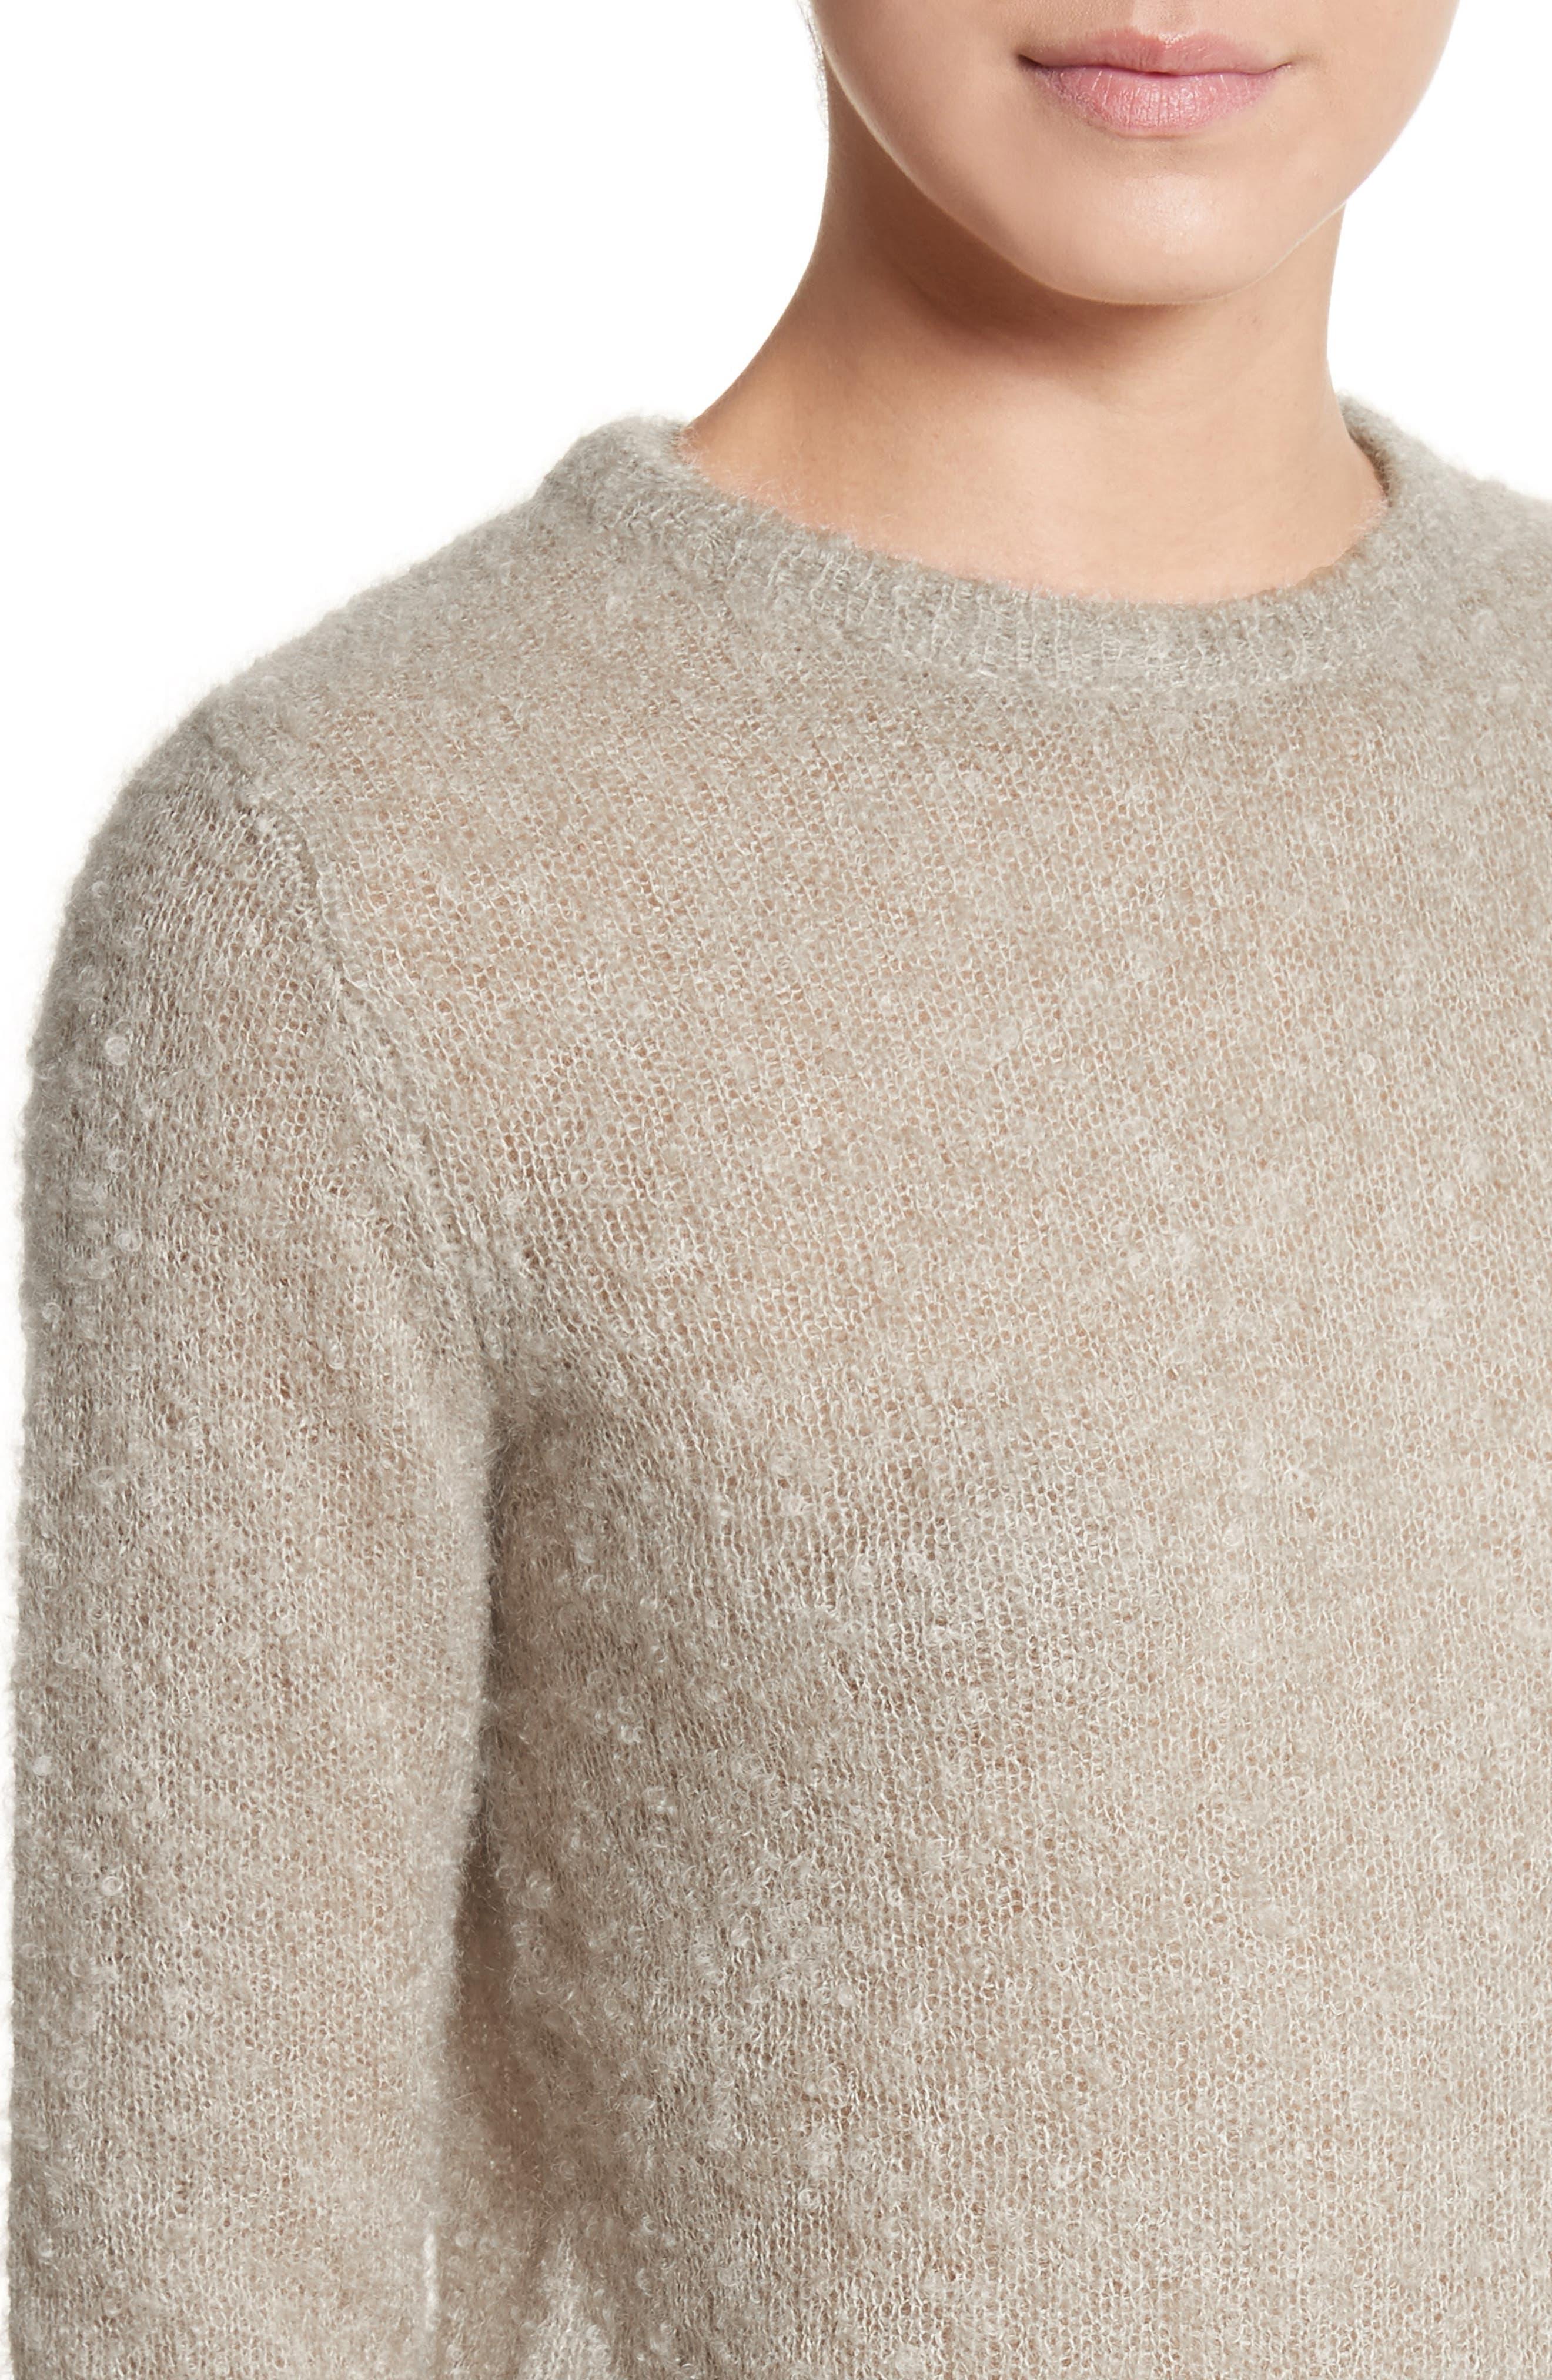 Tatum Mohair & Silk Sweater,                             Alternate thumbnail 4, color,                             020